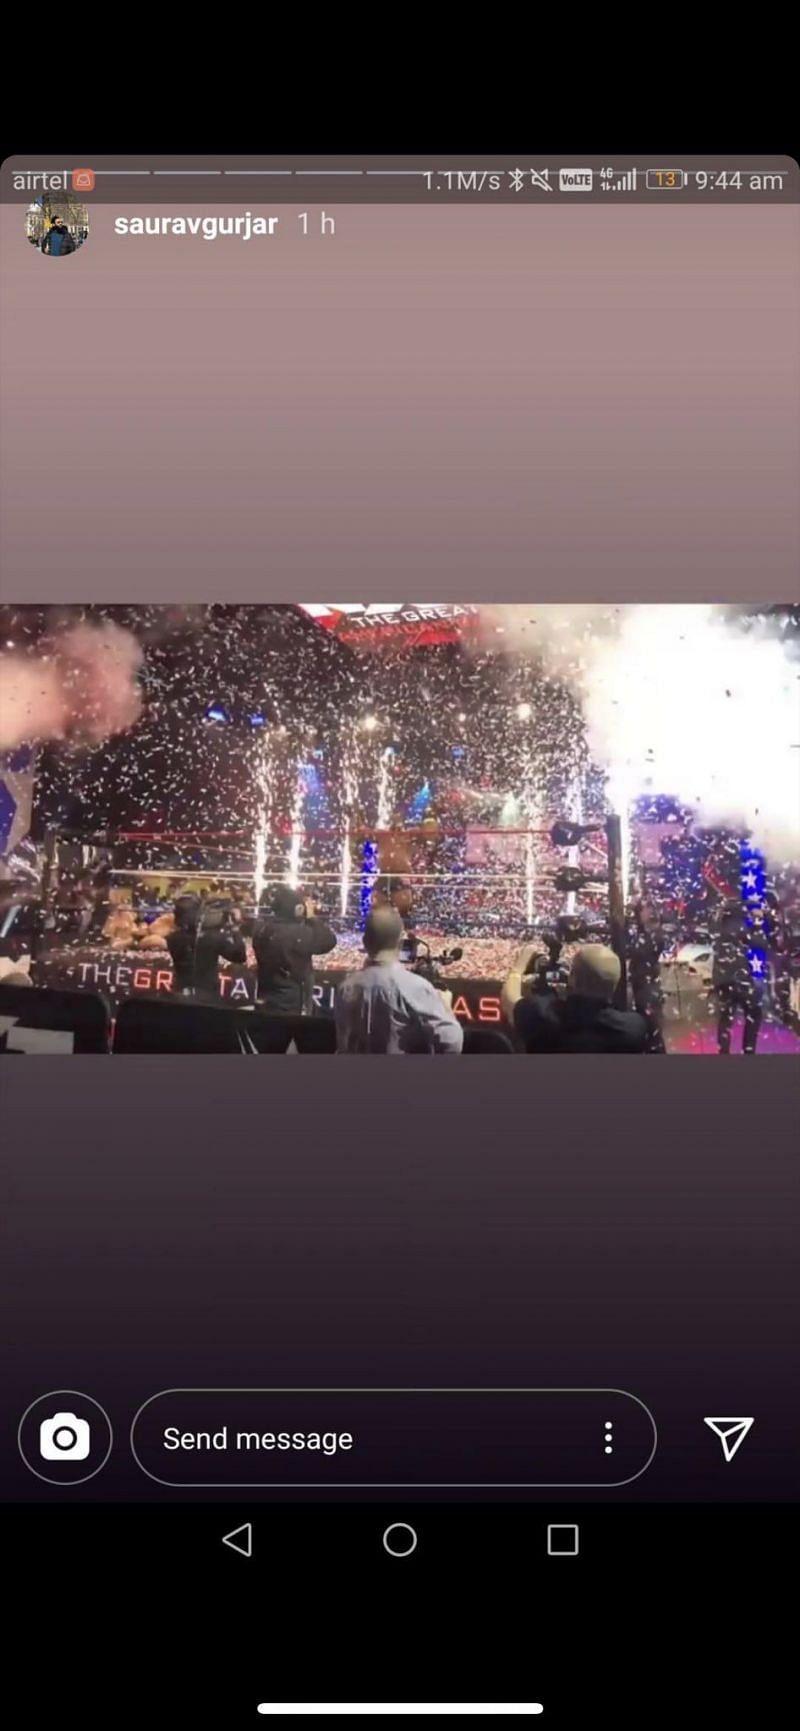 Saurav Gurjar seemingly spoiled the result of Cole vs. Lee